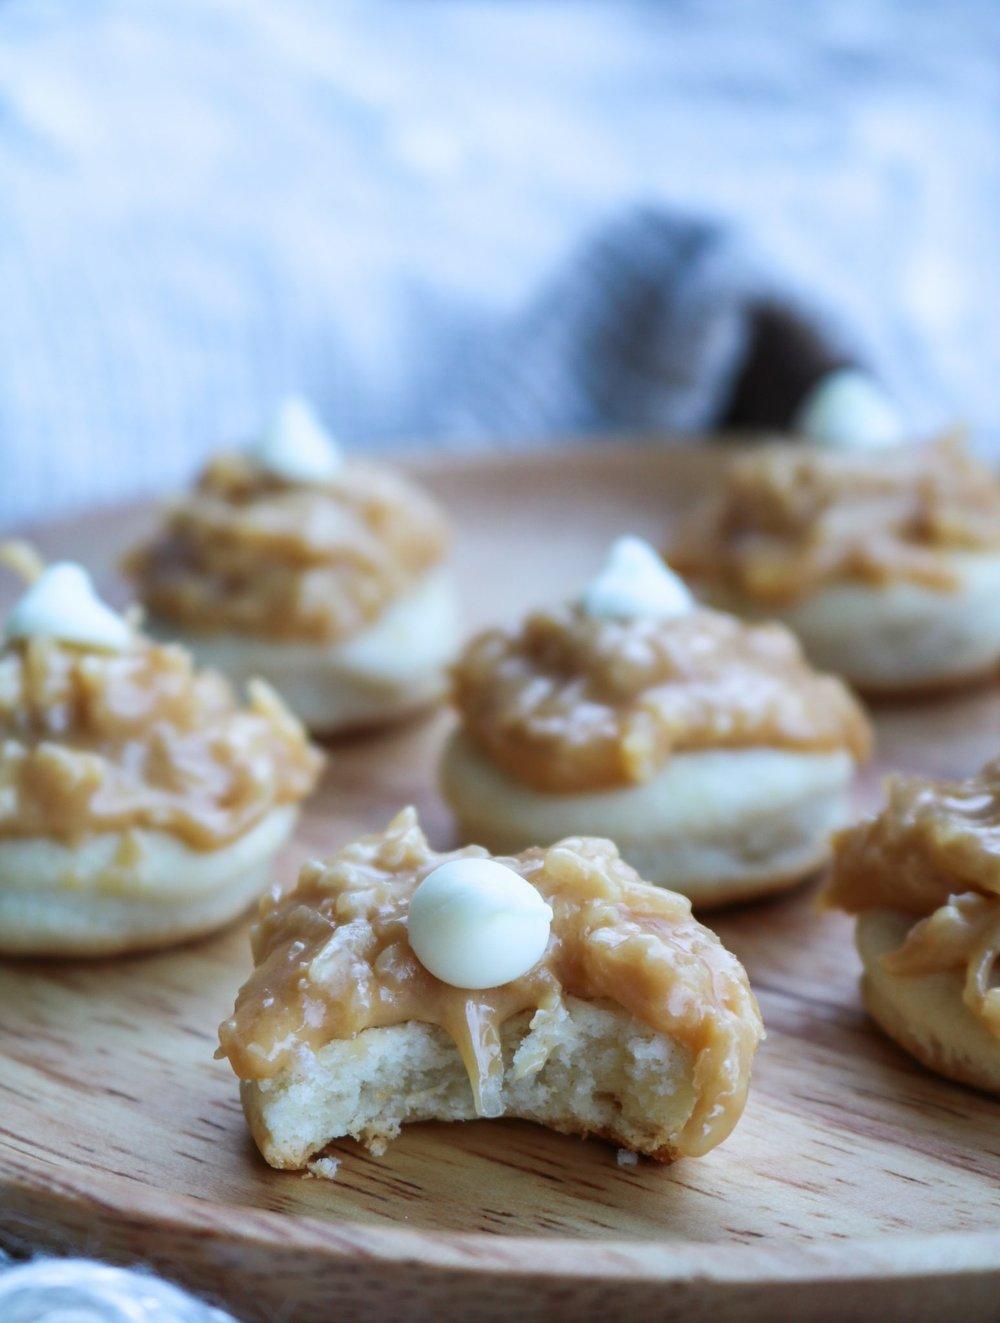 The-Hungarian-Brunette-Dulce-de-leche-coco-cookies-recipe-8-of-9.jpg